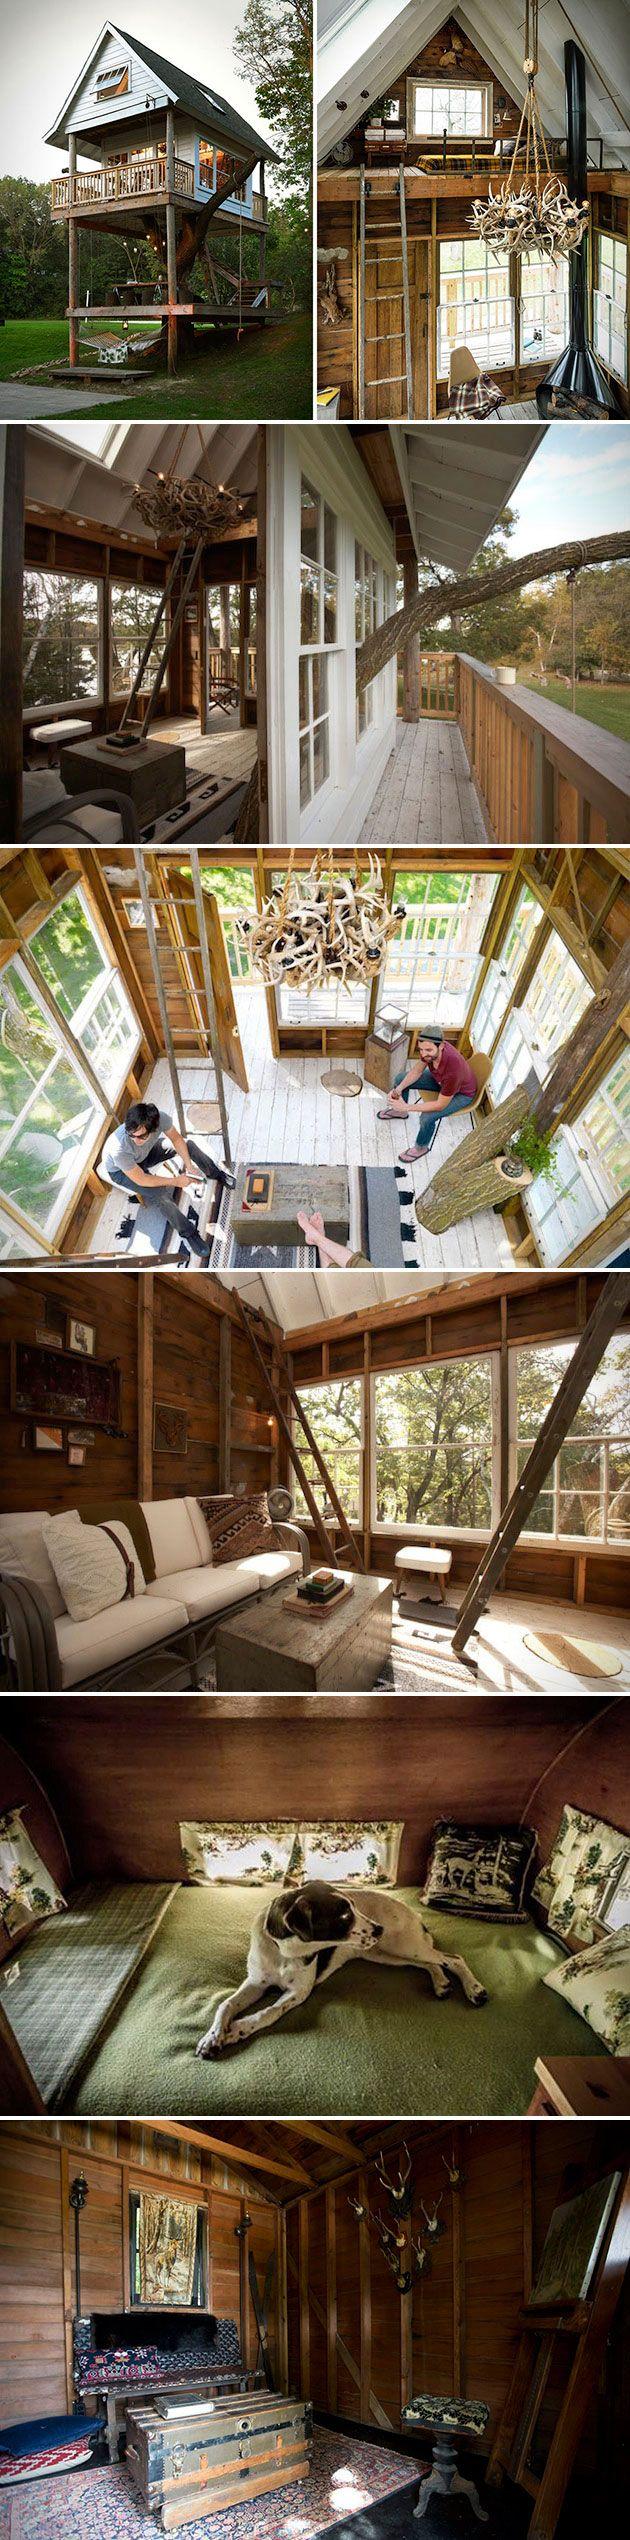 Camp Wandawega Adult Treehouse | Riverside | Pinterest | Minihaus ...